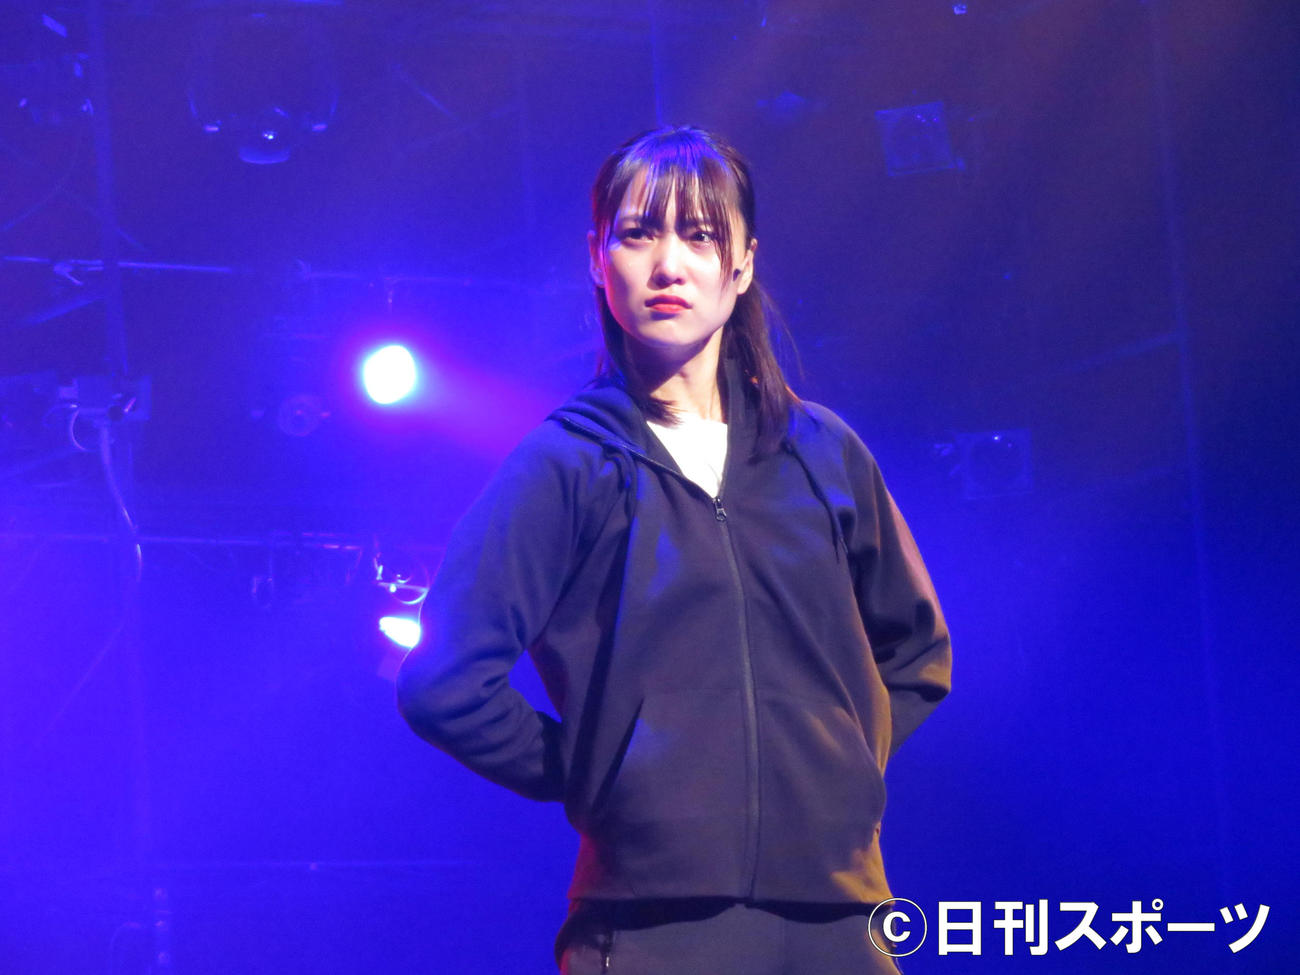 主演舞台「飛龍伝2020」で熱演する菅井友香(撮影・横山慧)